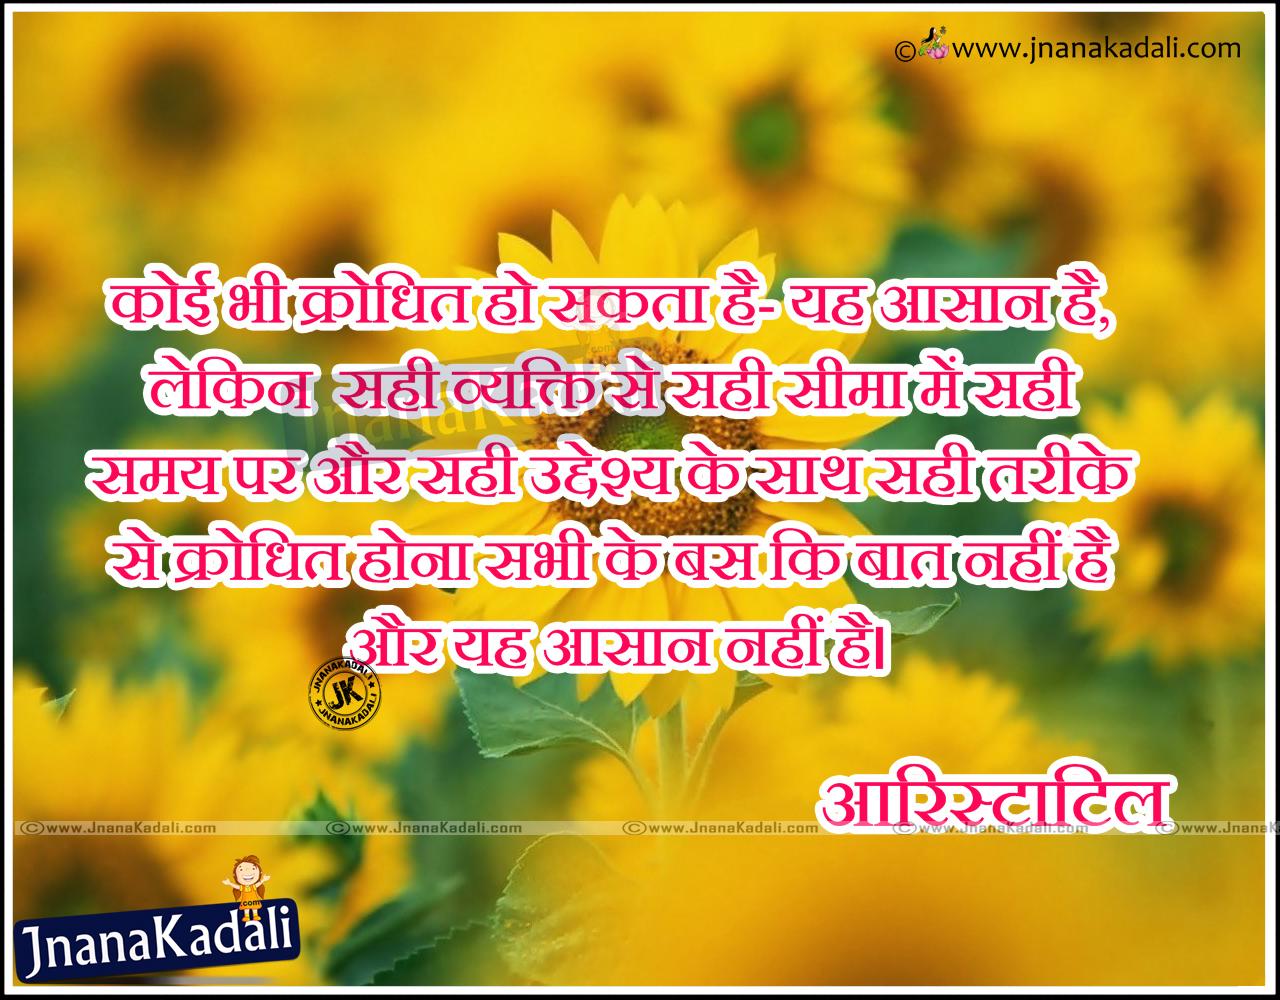 Quotes For A Successful Life Successful Life Quotationsaristotle In Telugu  Jnana Kadali